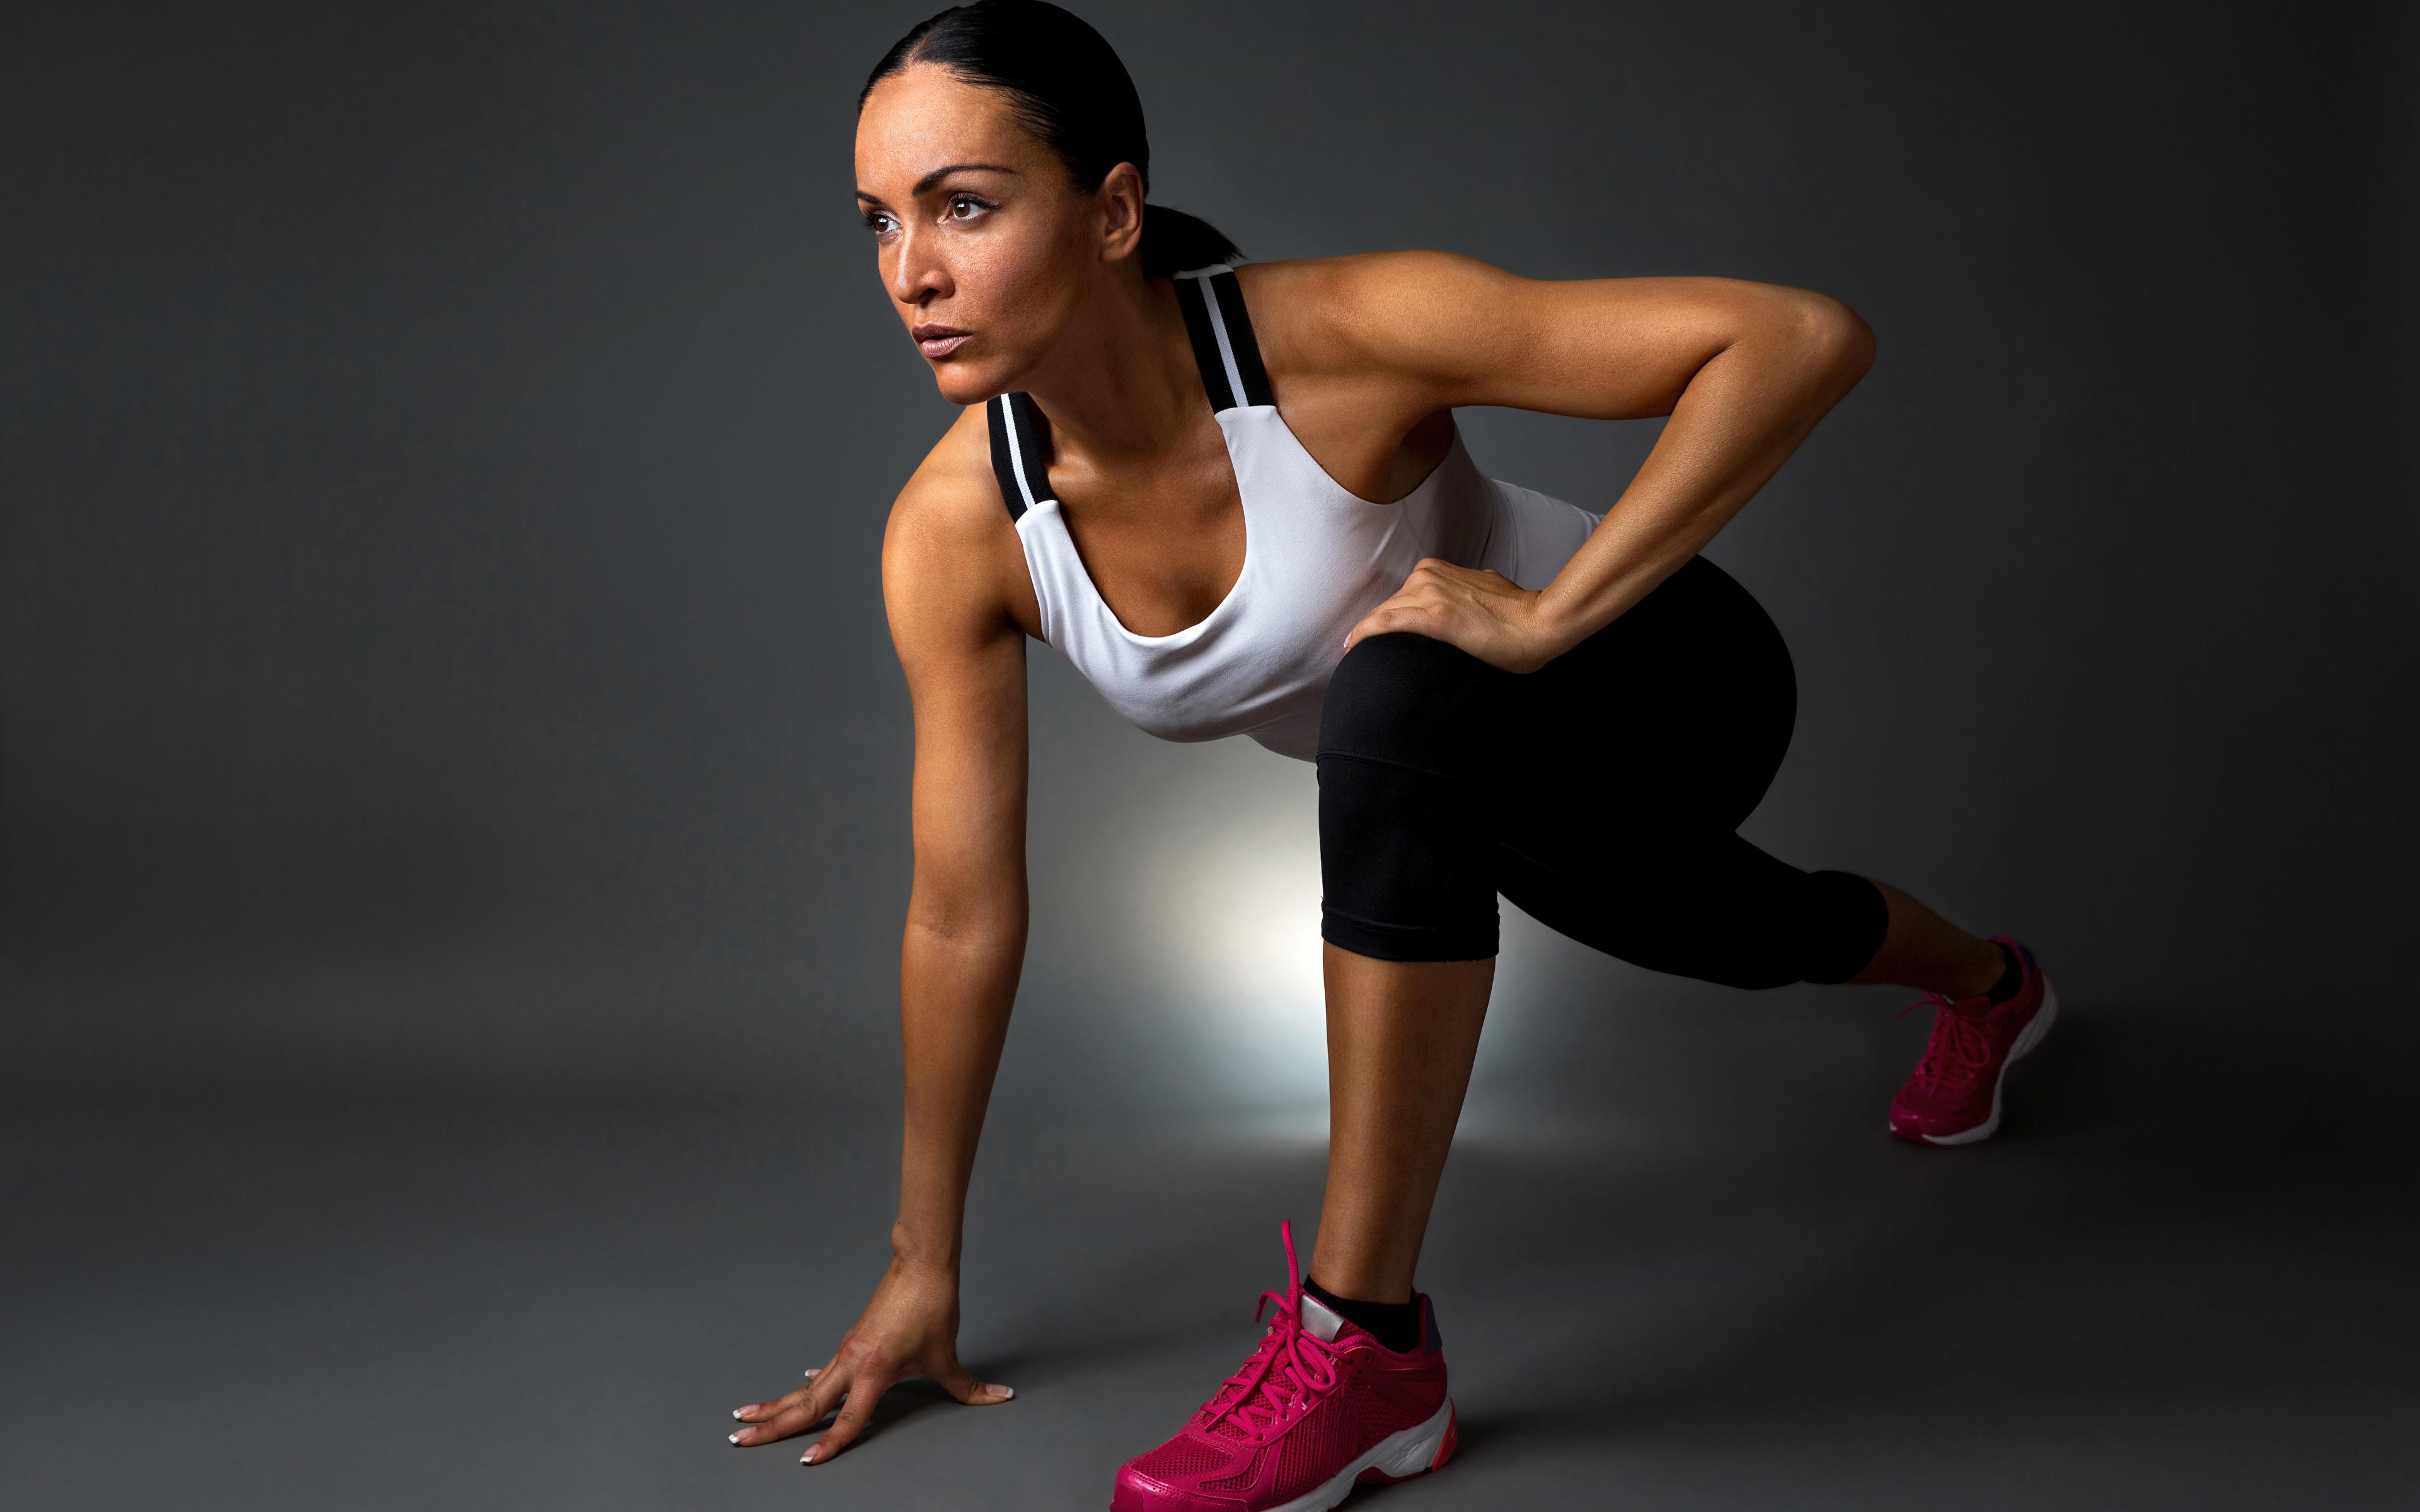 Wallpapers Fitness Girls Sport Singlet 3840x2400